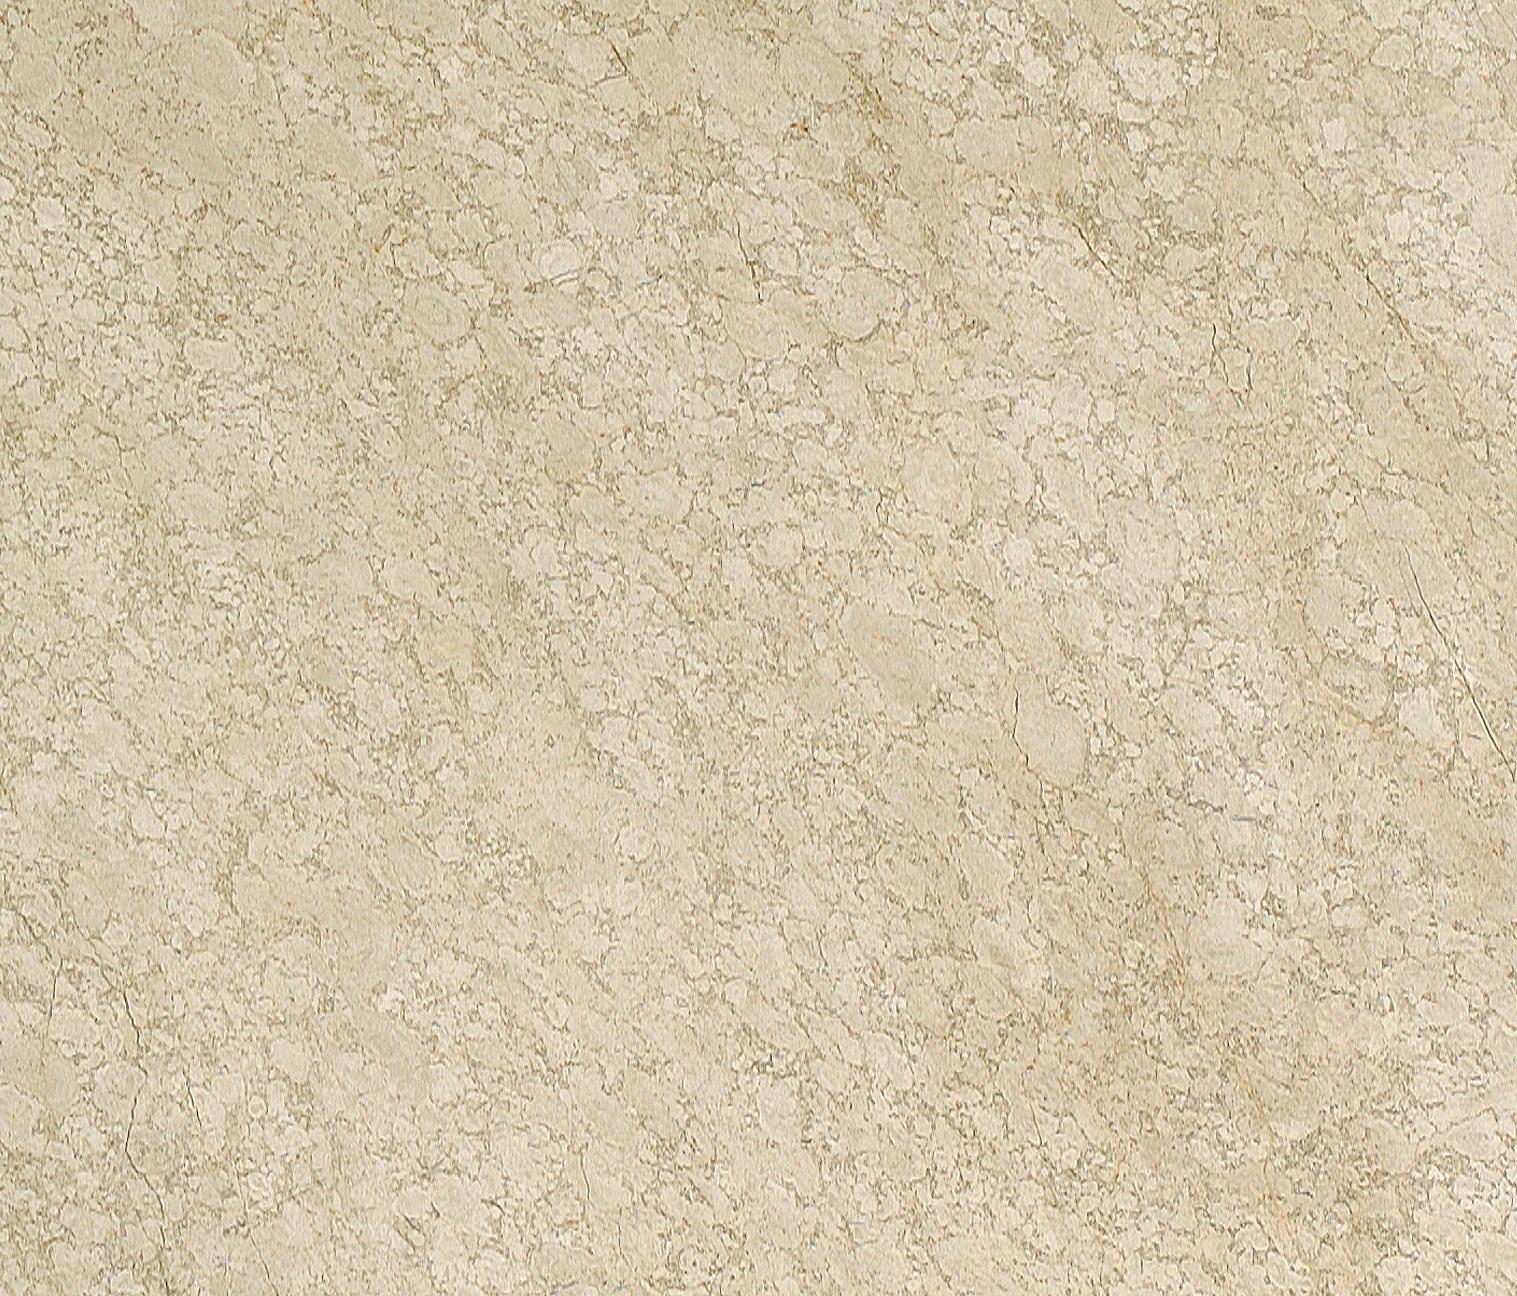 Marble crema b ltico natural stone panels from levantina - Levantina novelda ...